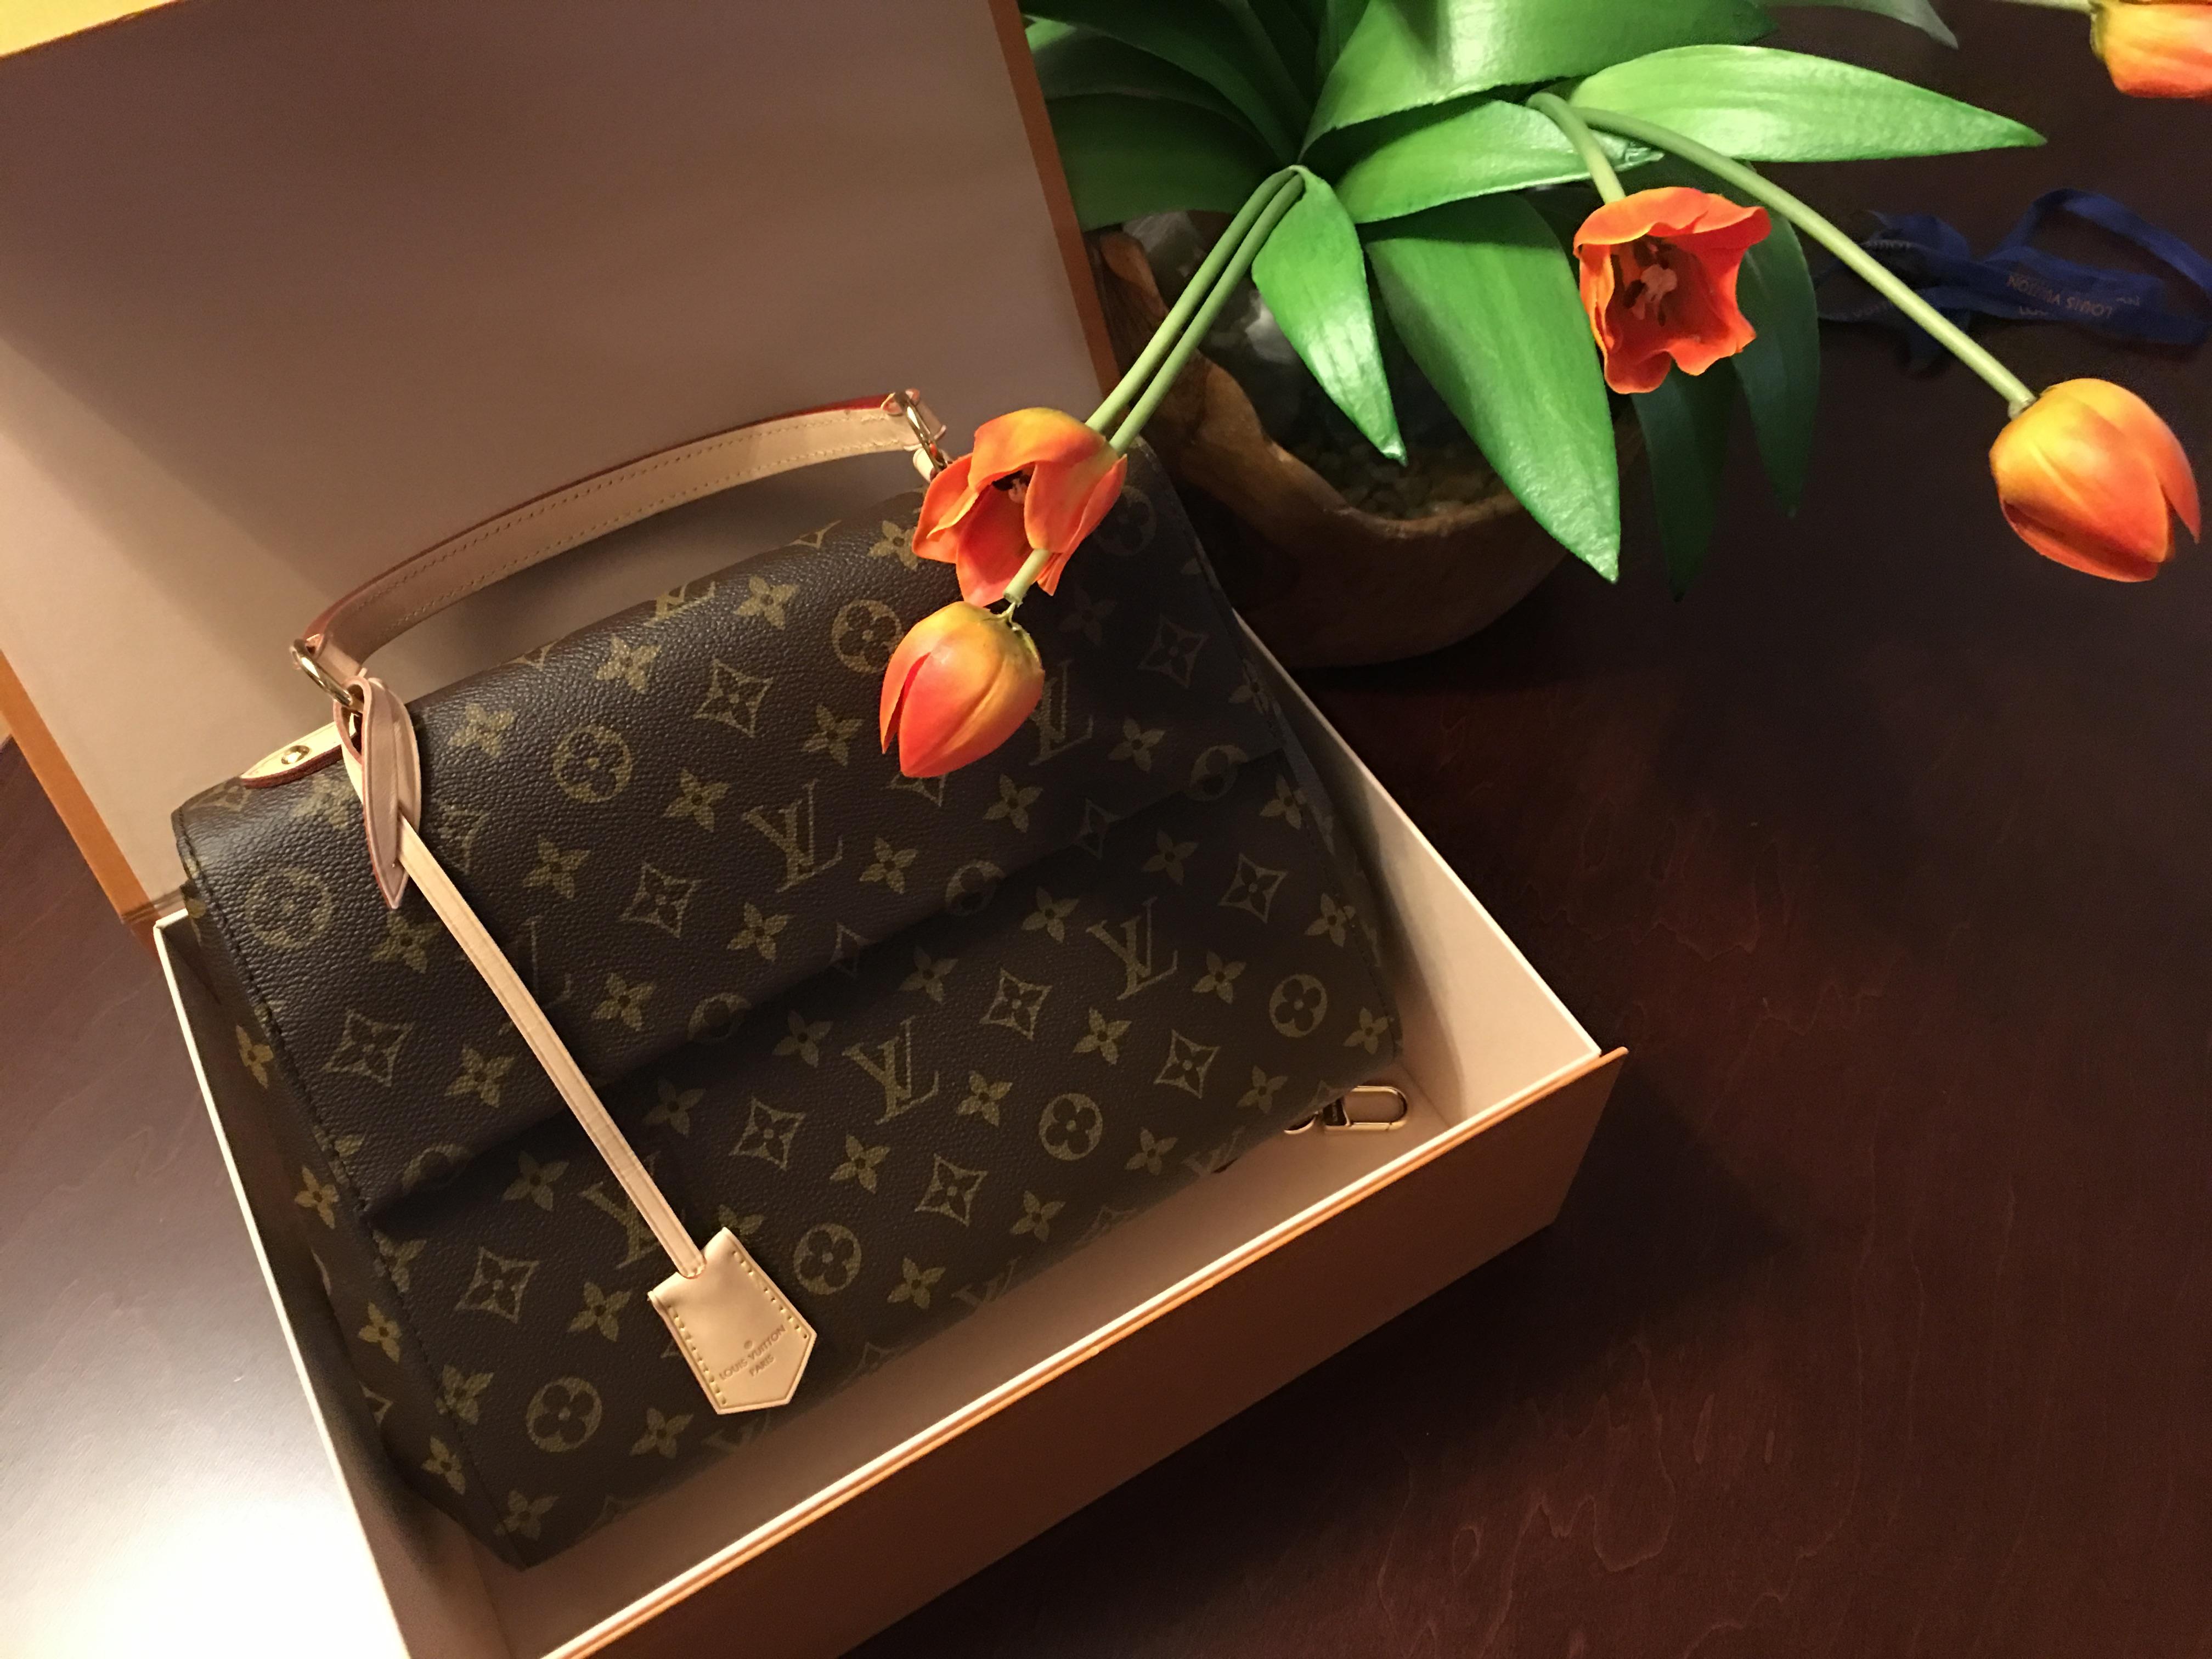 Luis Vuitton  handbag in box